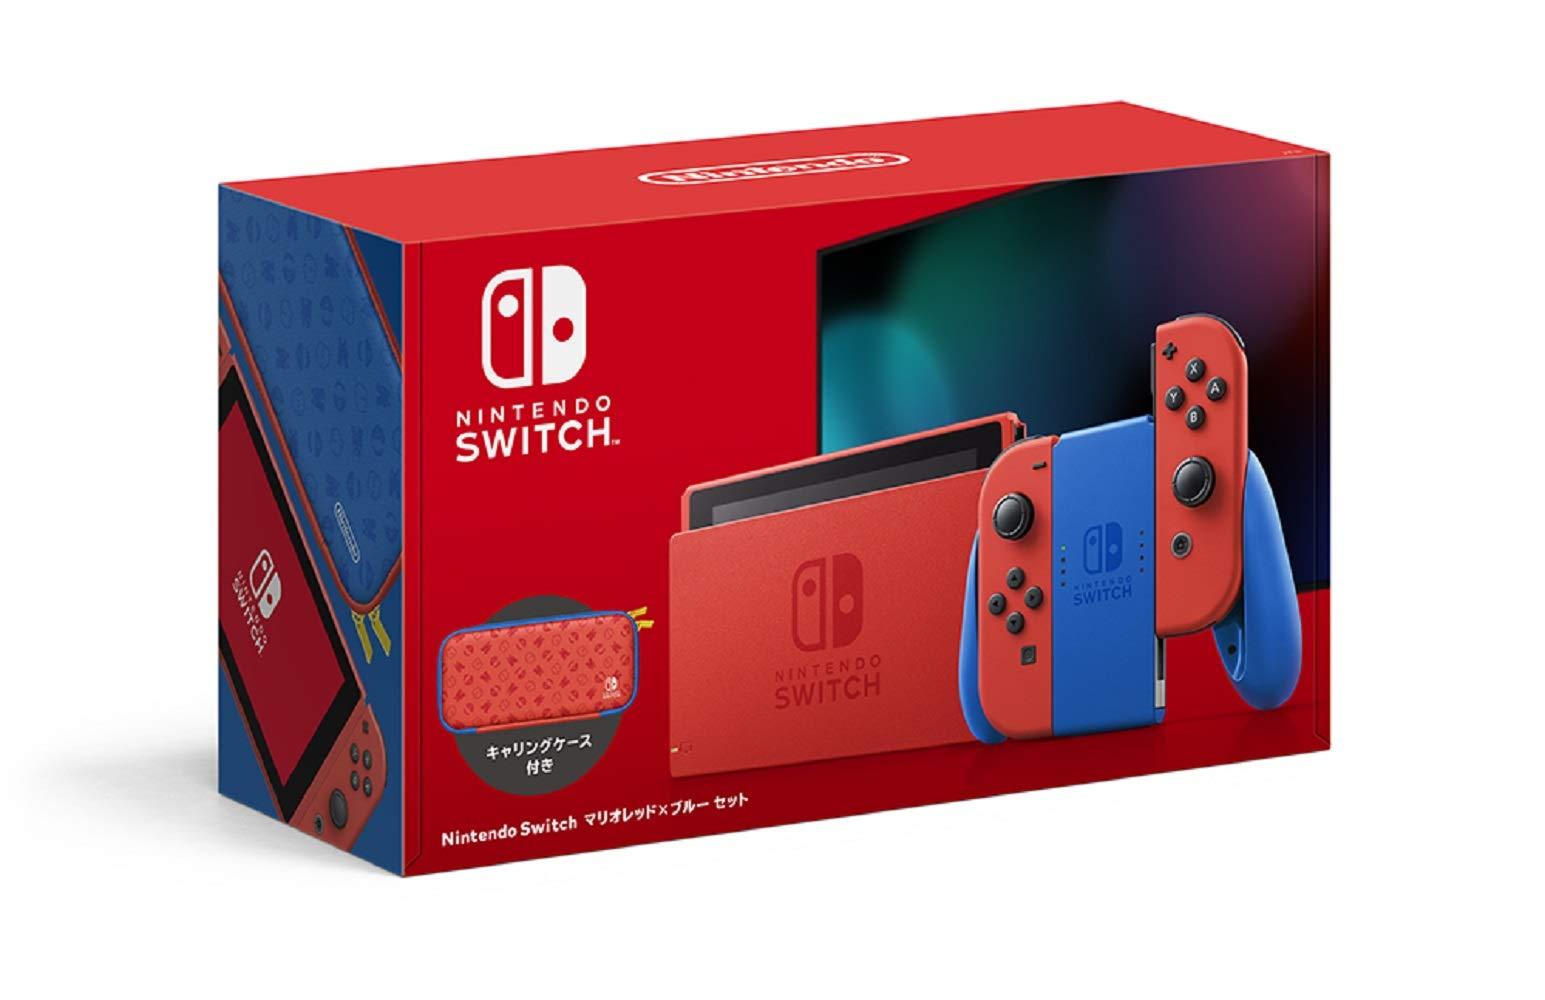 『Nintendo Switch マリオレッド×ブルー セット』の抽選販売【ジョーシン】店頭受取